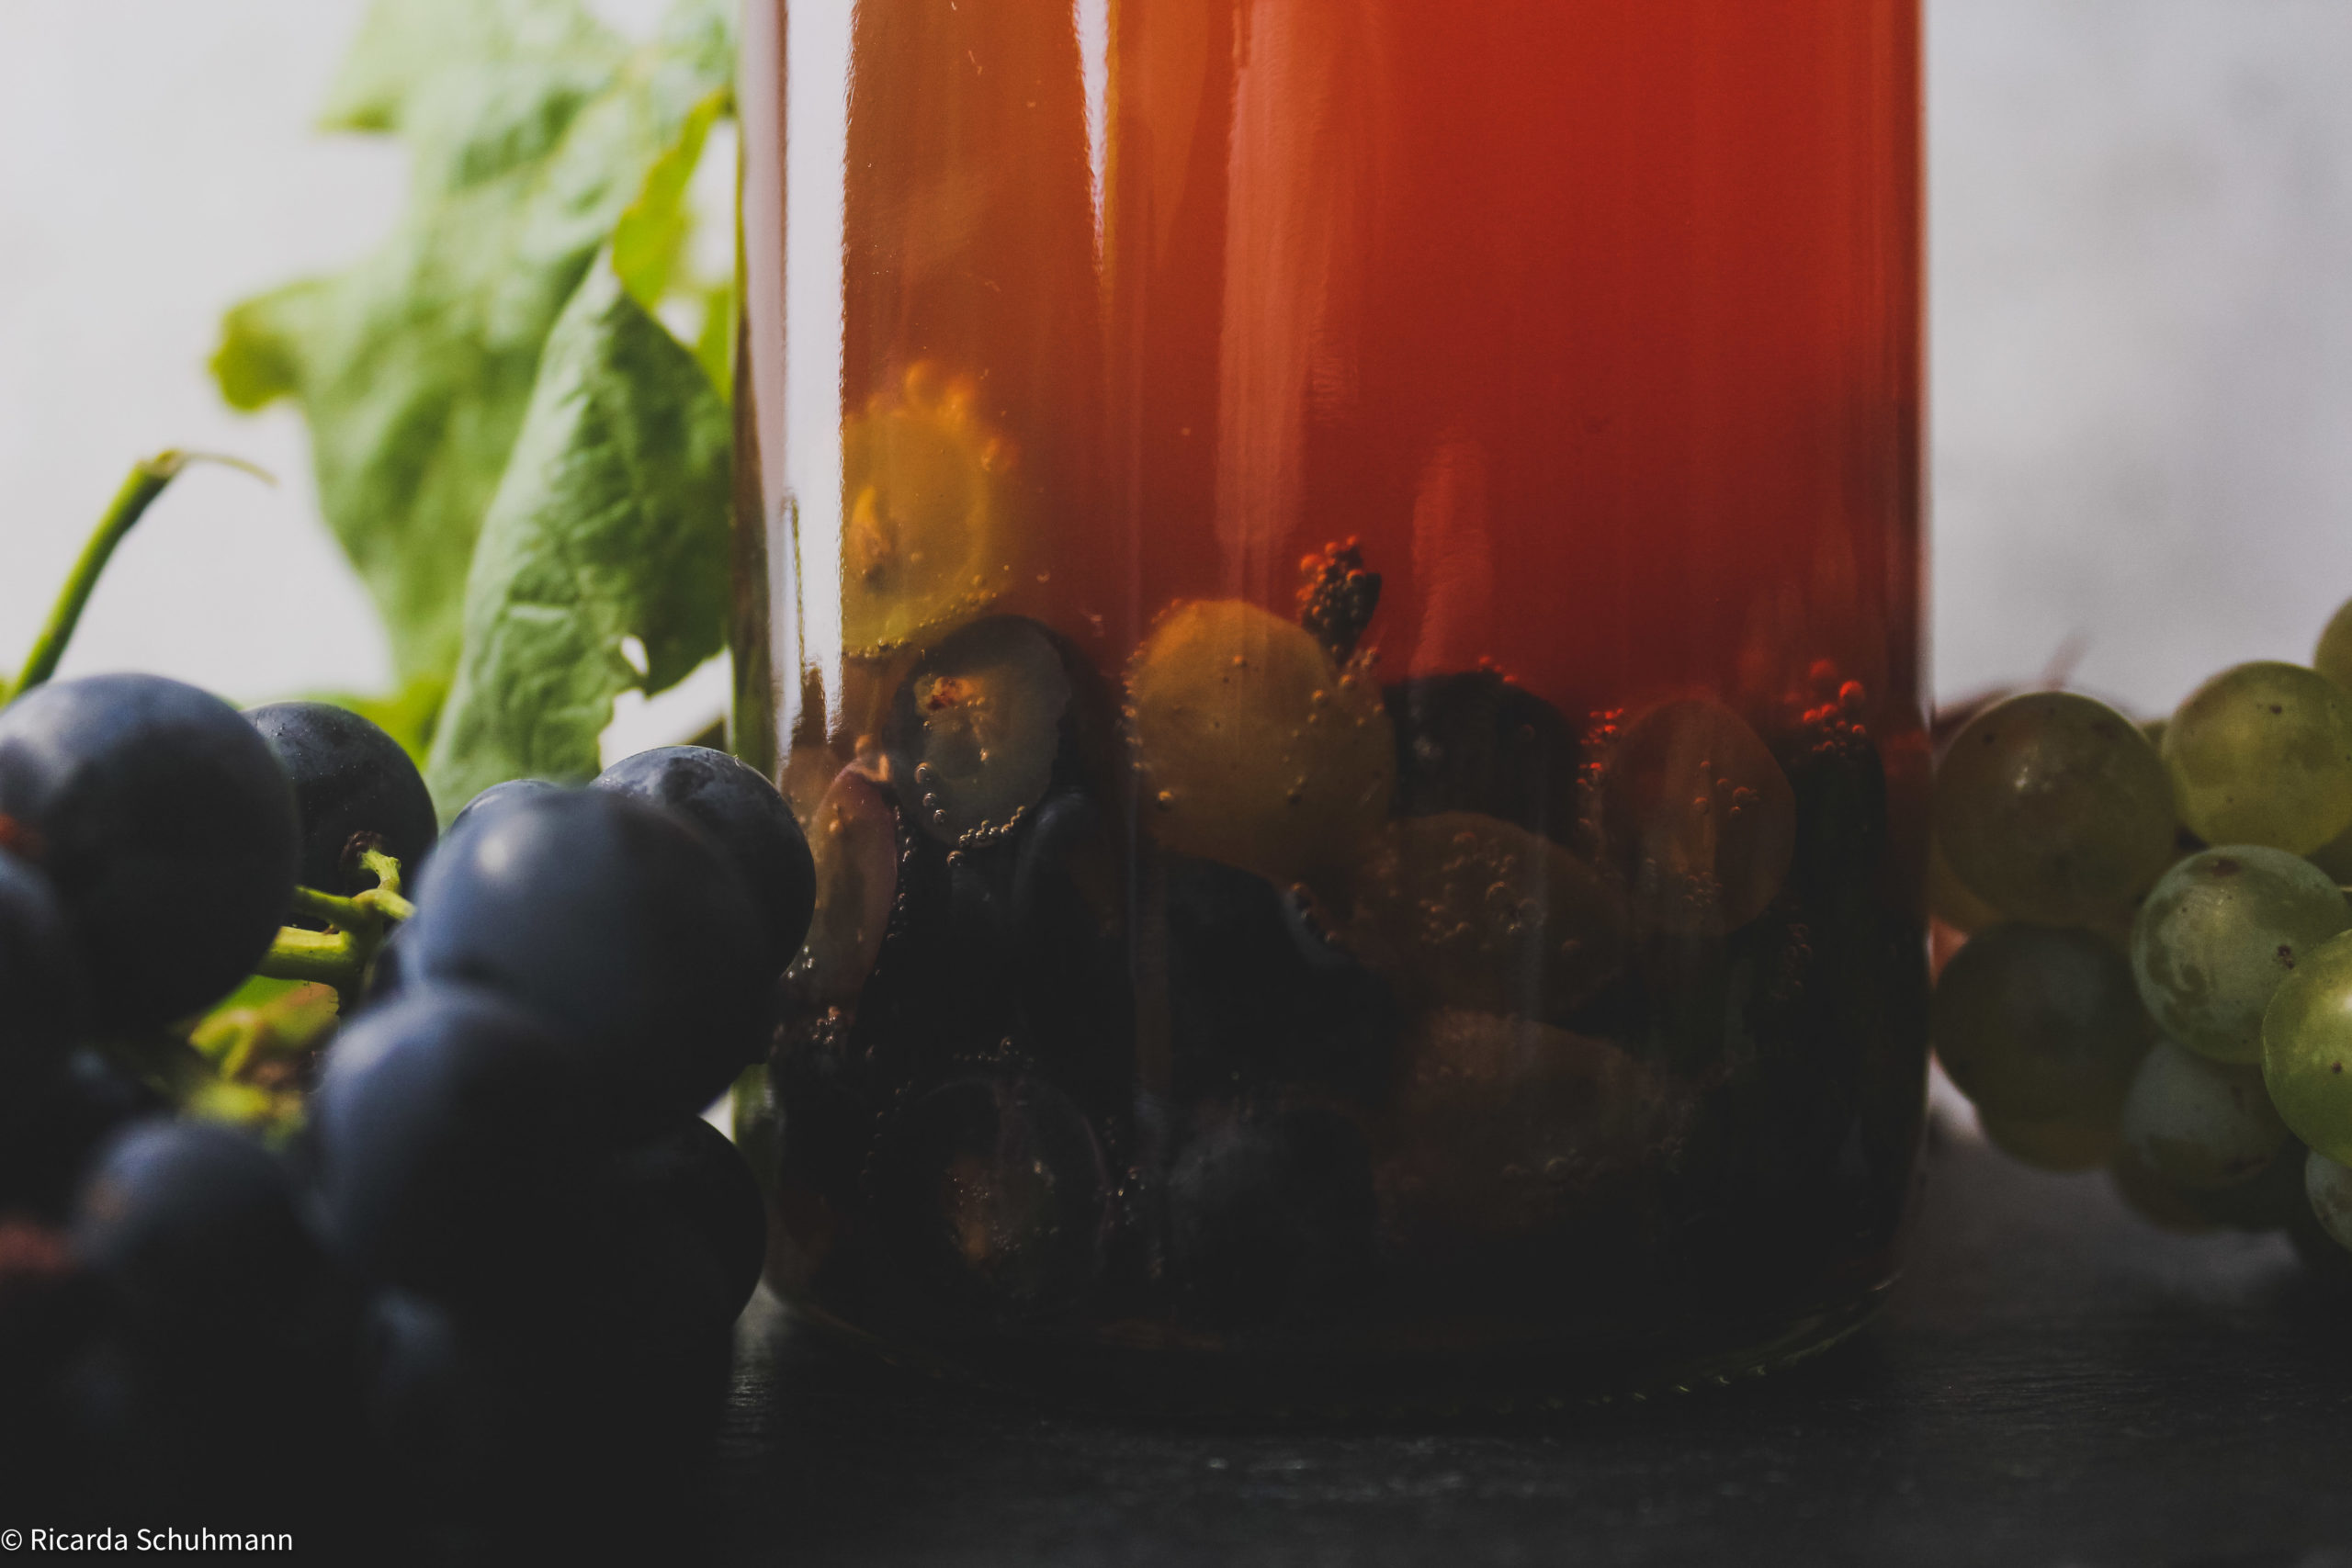 Kombucha mit Trauben fermentiert